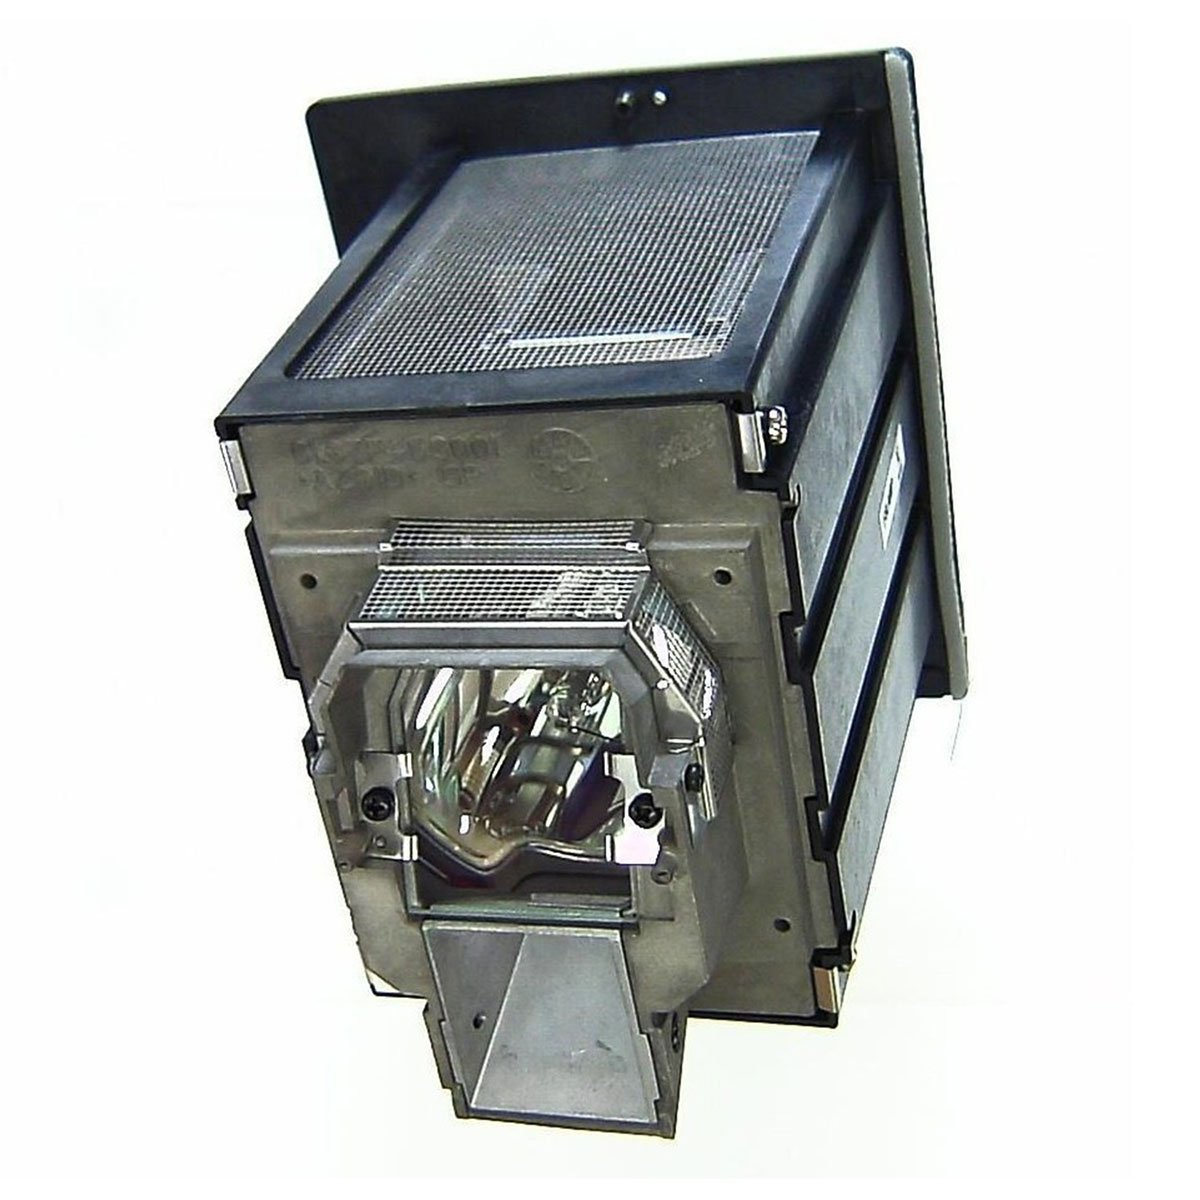 SpArc プロジェクター交換用ランプ 囲い/電球付き Optoma DM16用 Economy Economy Lamp with Housing B07MPQT9MP